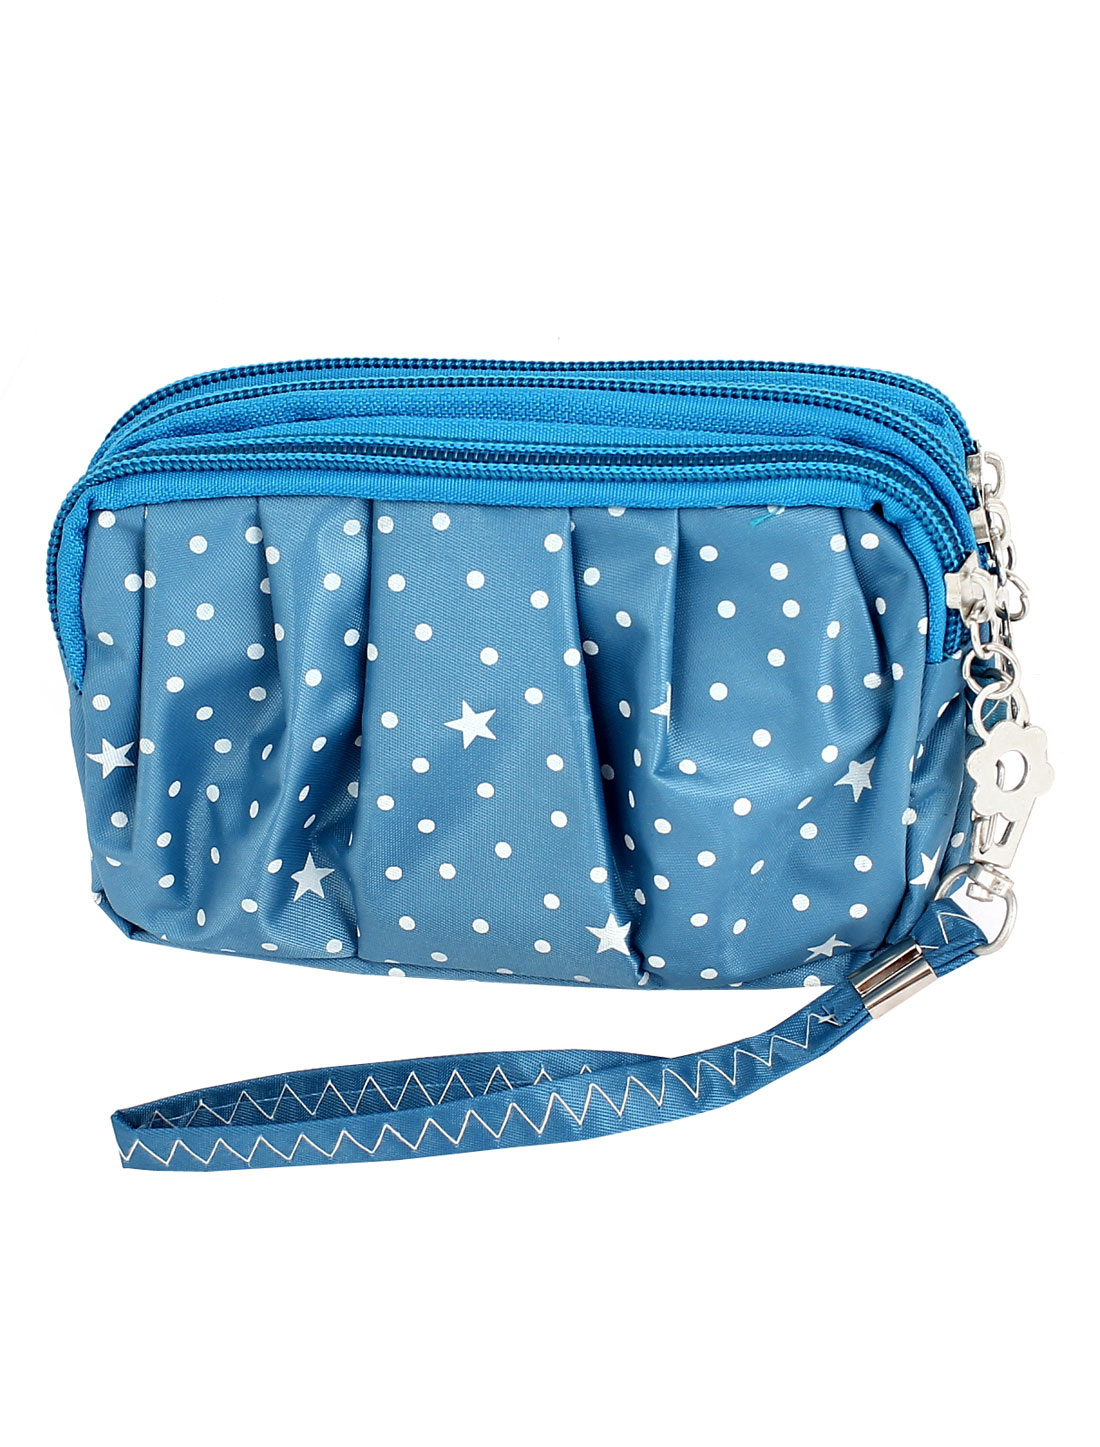 Lady Dot Pattern 3 Zipper Closure Handhold Cellphone Wallet Purse Royal Blue